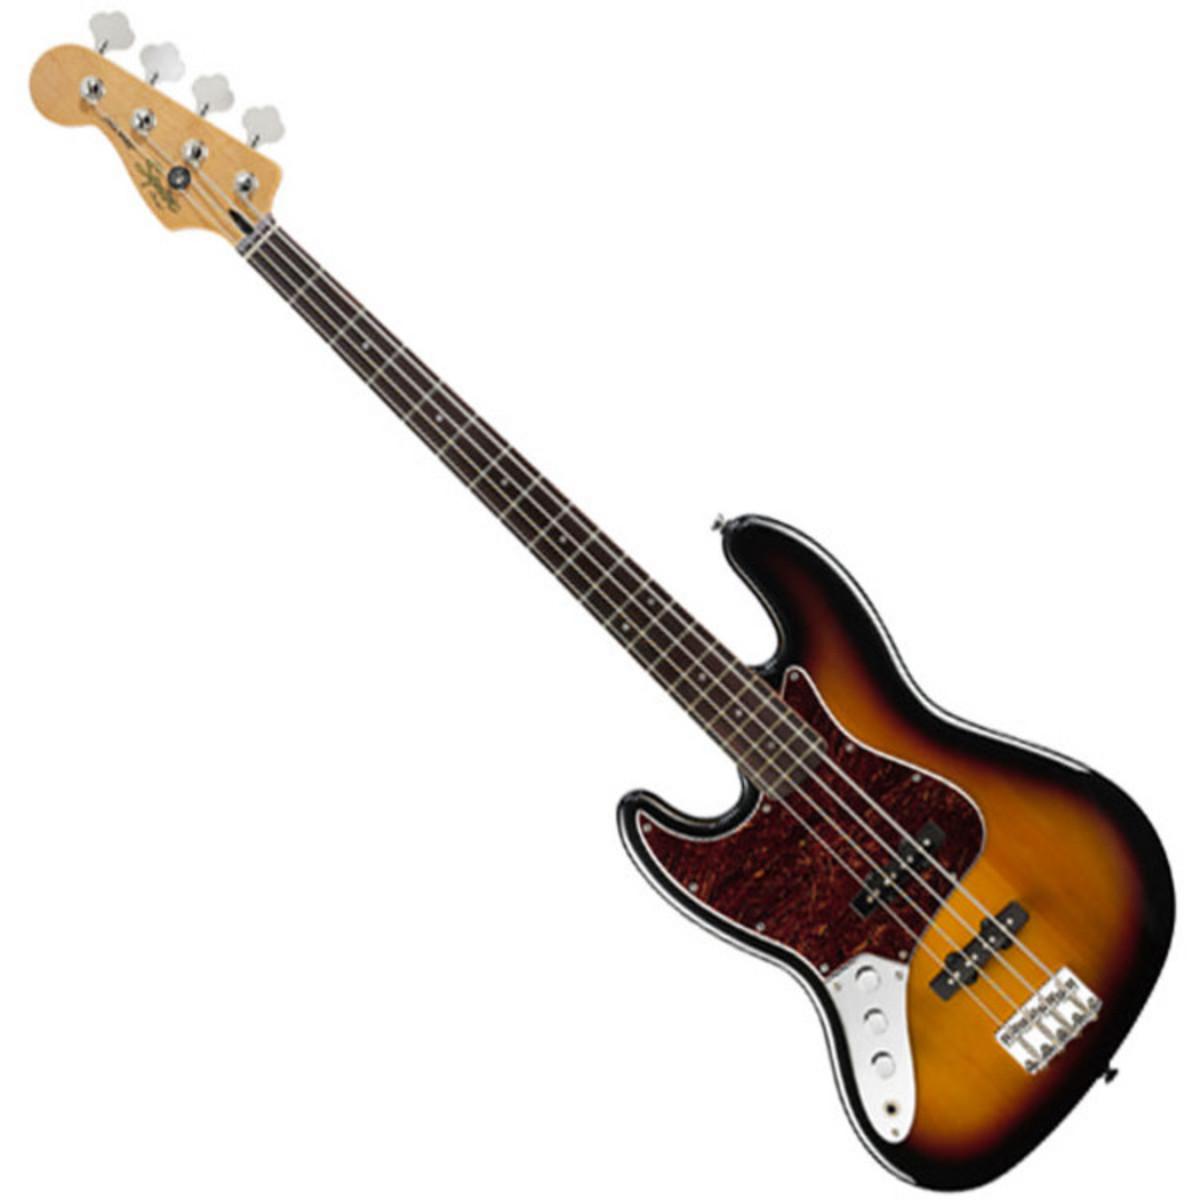 squier by fender vintage modified jazz bass left handed 3ts at. Black Bedroom Furniture Sets. Home Design Ideas